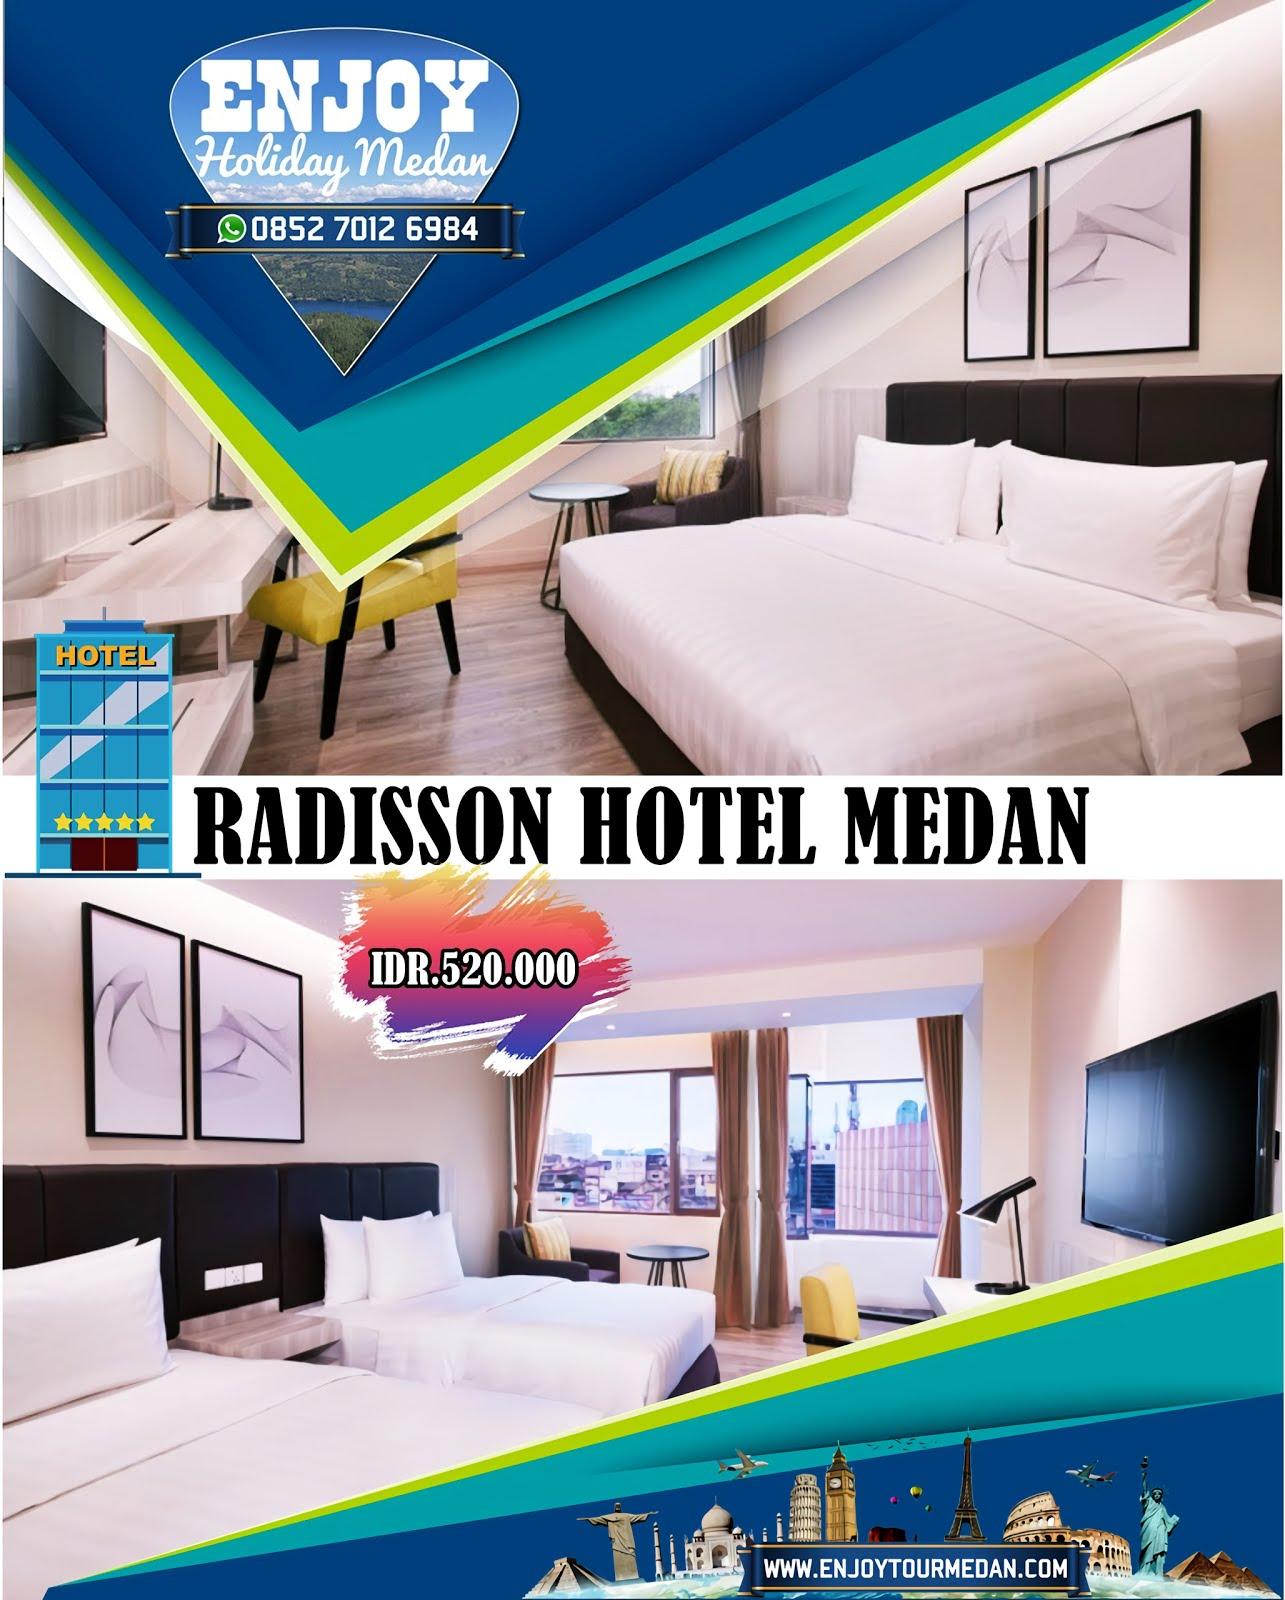 Promo Radisson Hotel Medan - Hotel Bintang 5